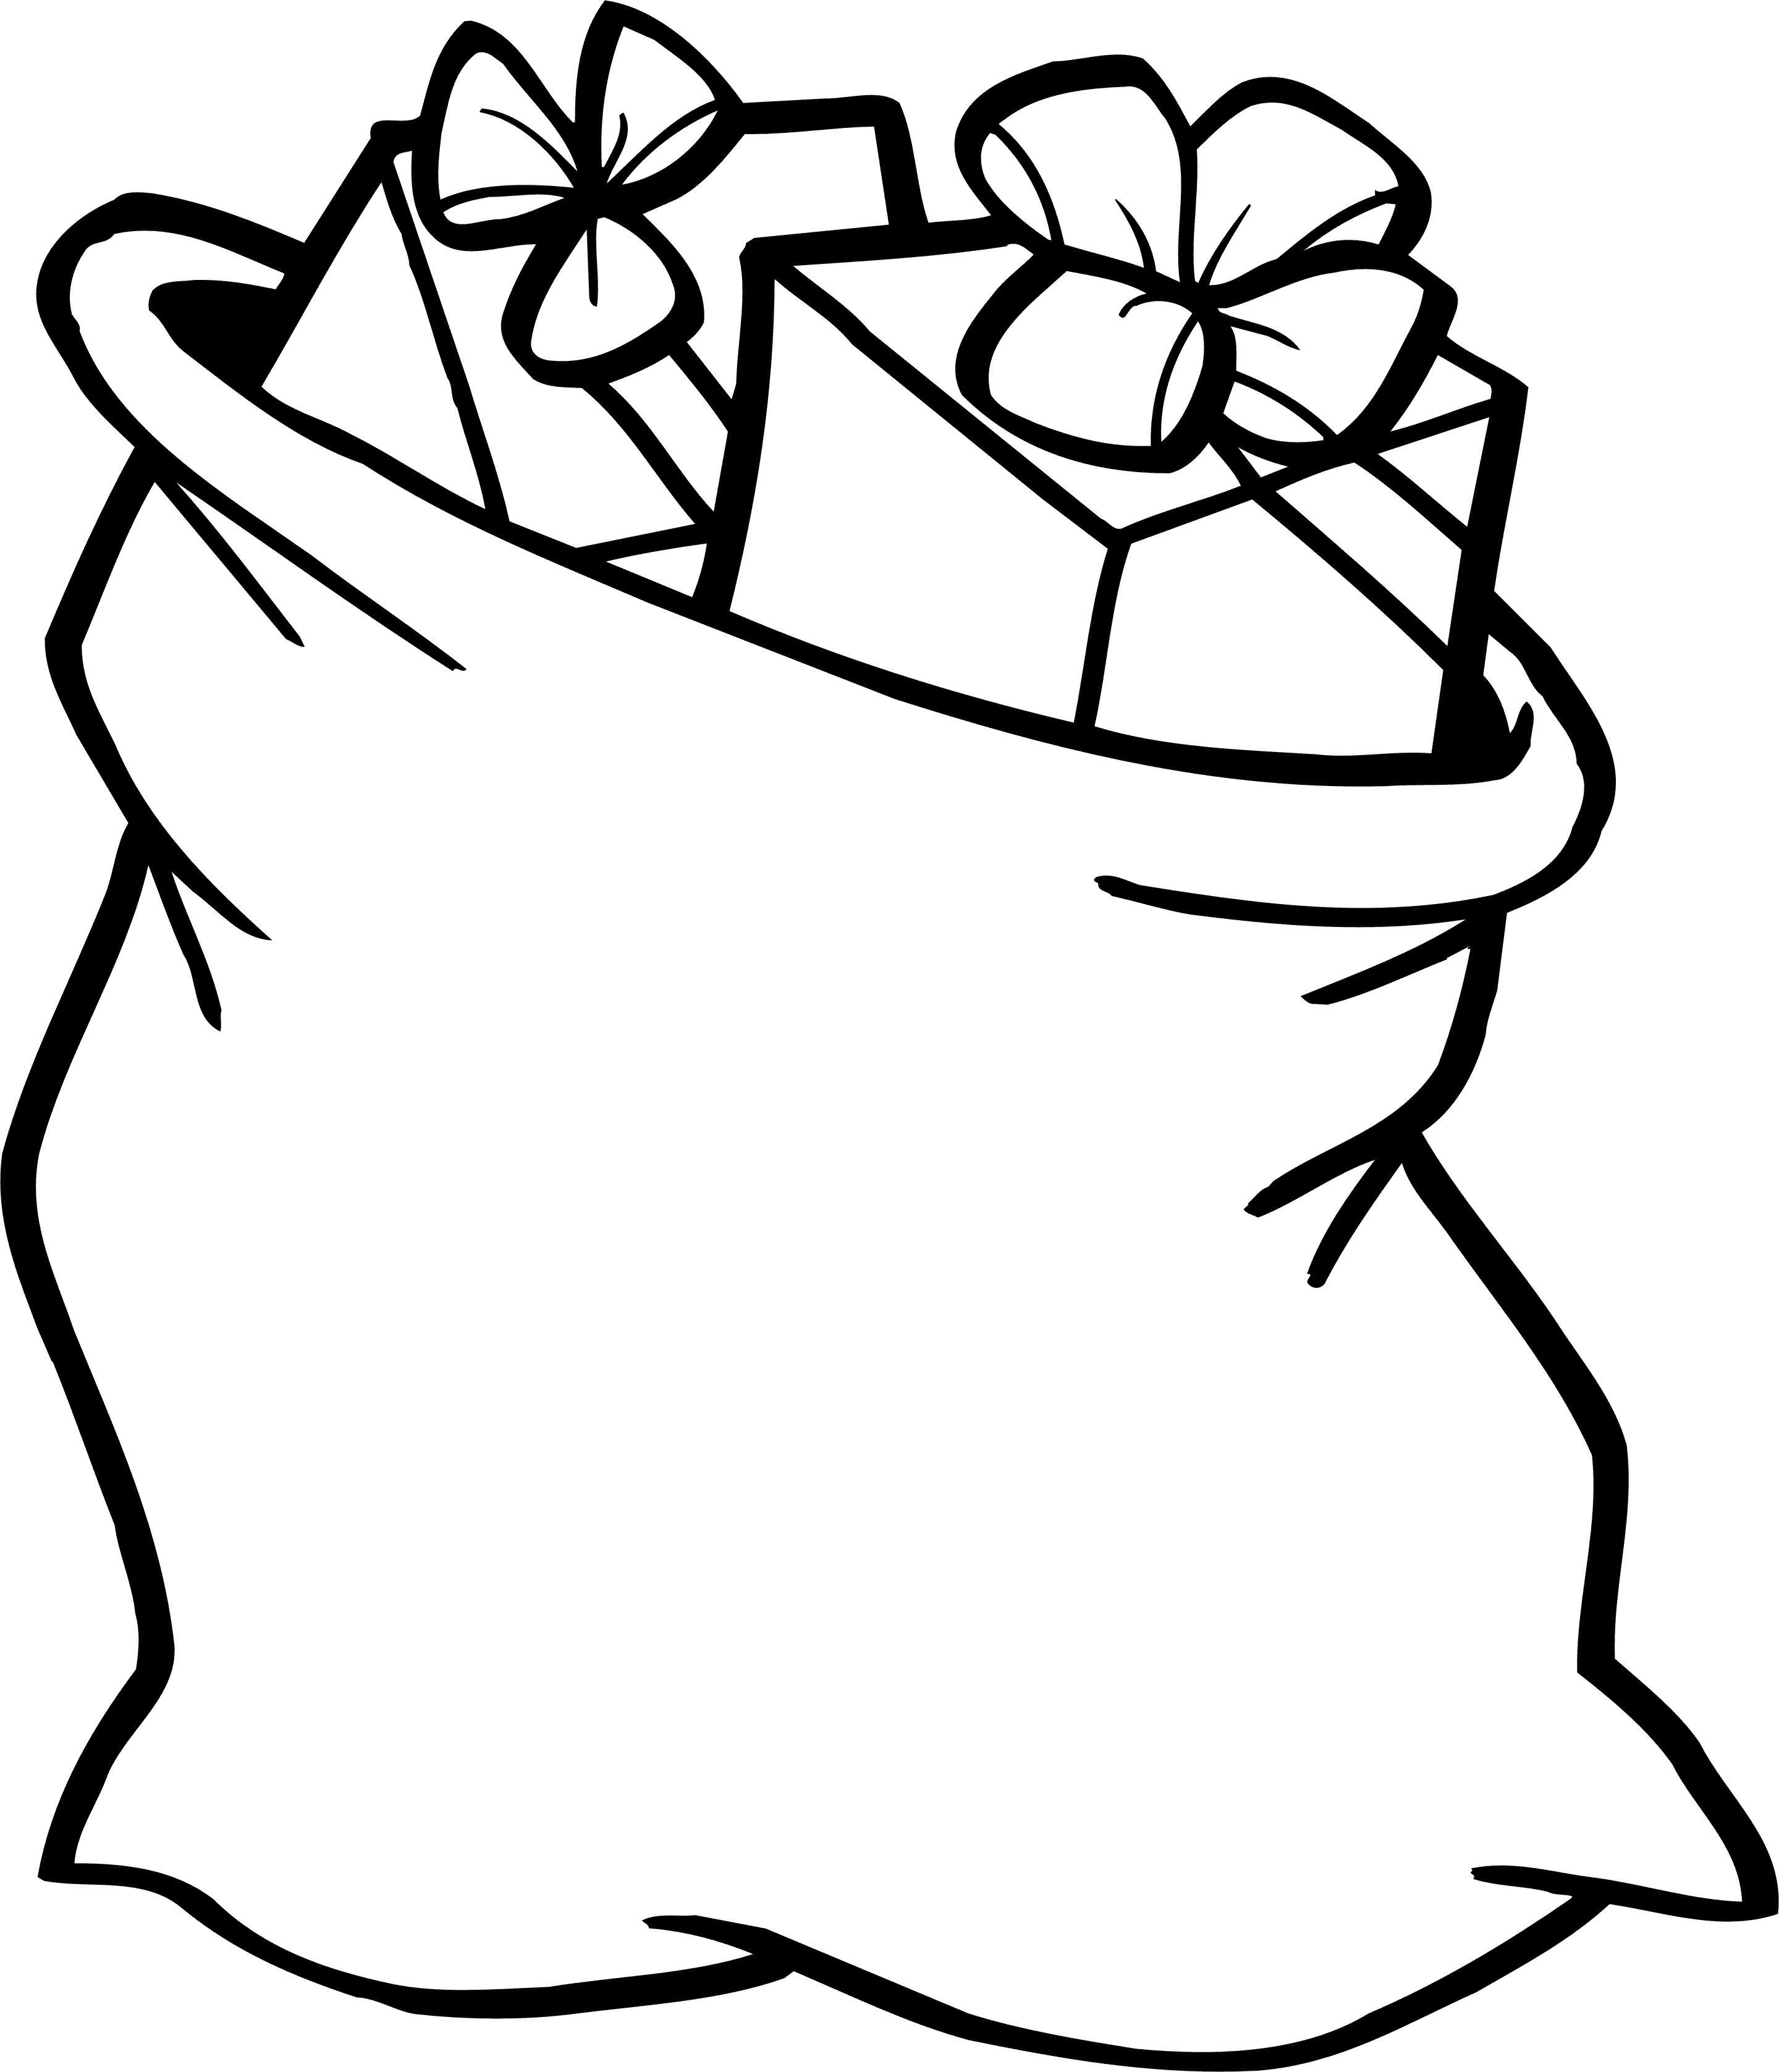 Мешок с подарками Раскраска сказочная зима